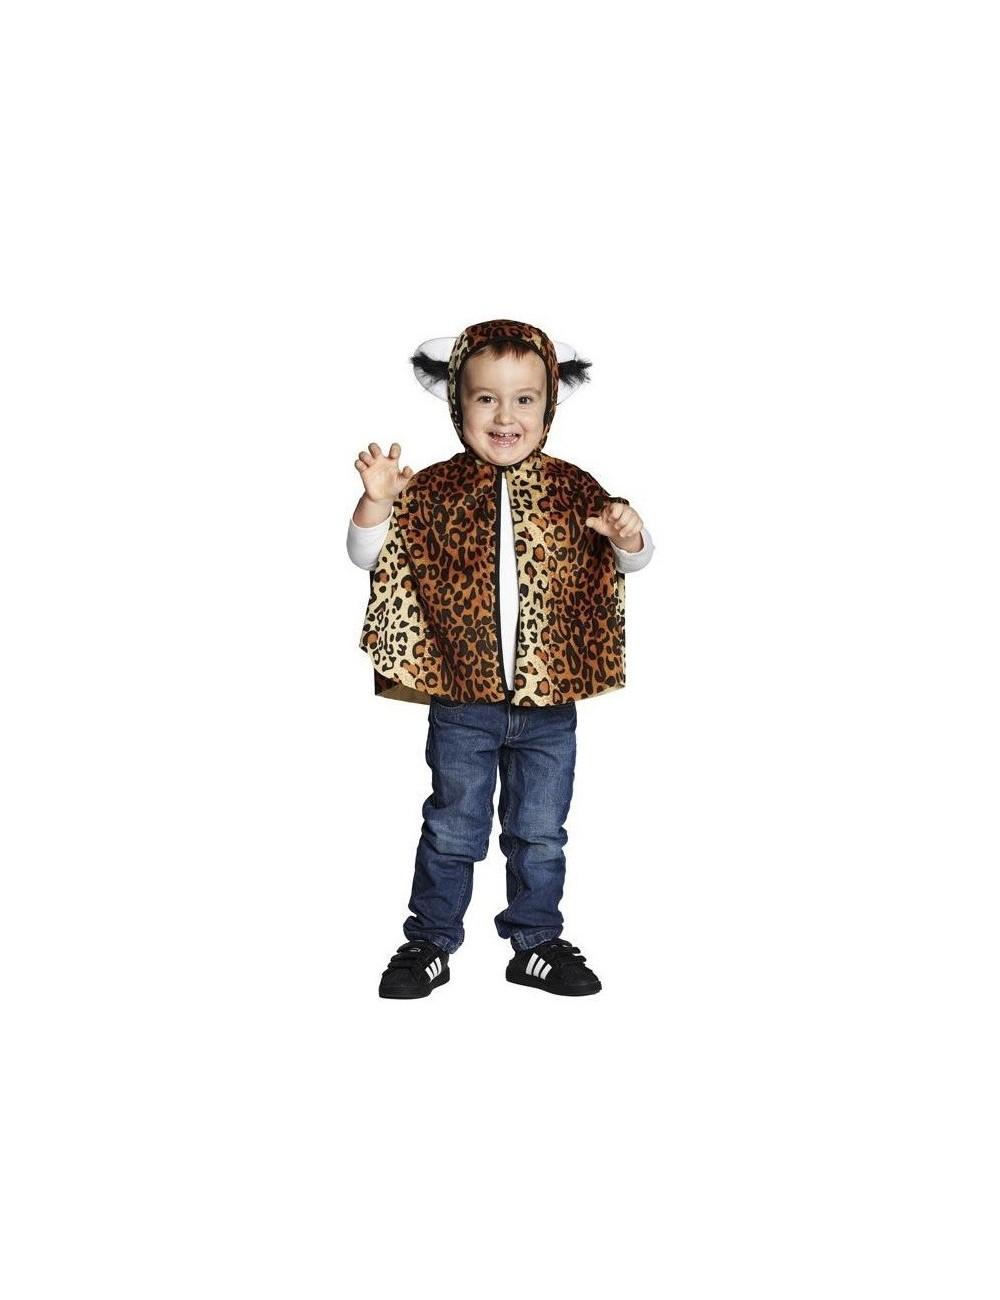 Costum Poncho Leopard de plus, copii 4 - 6 ani